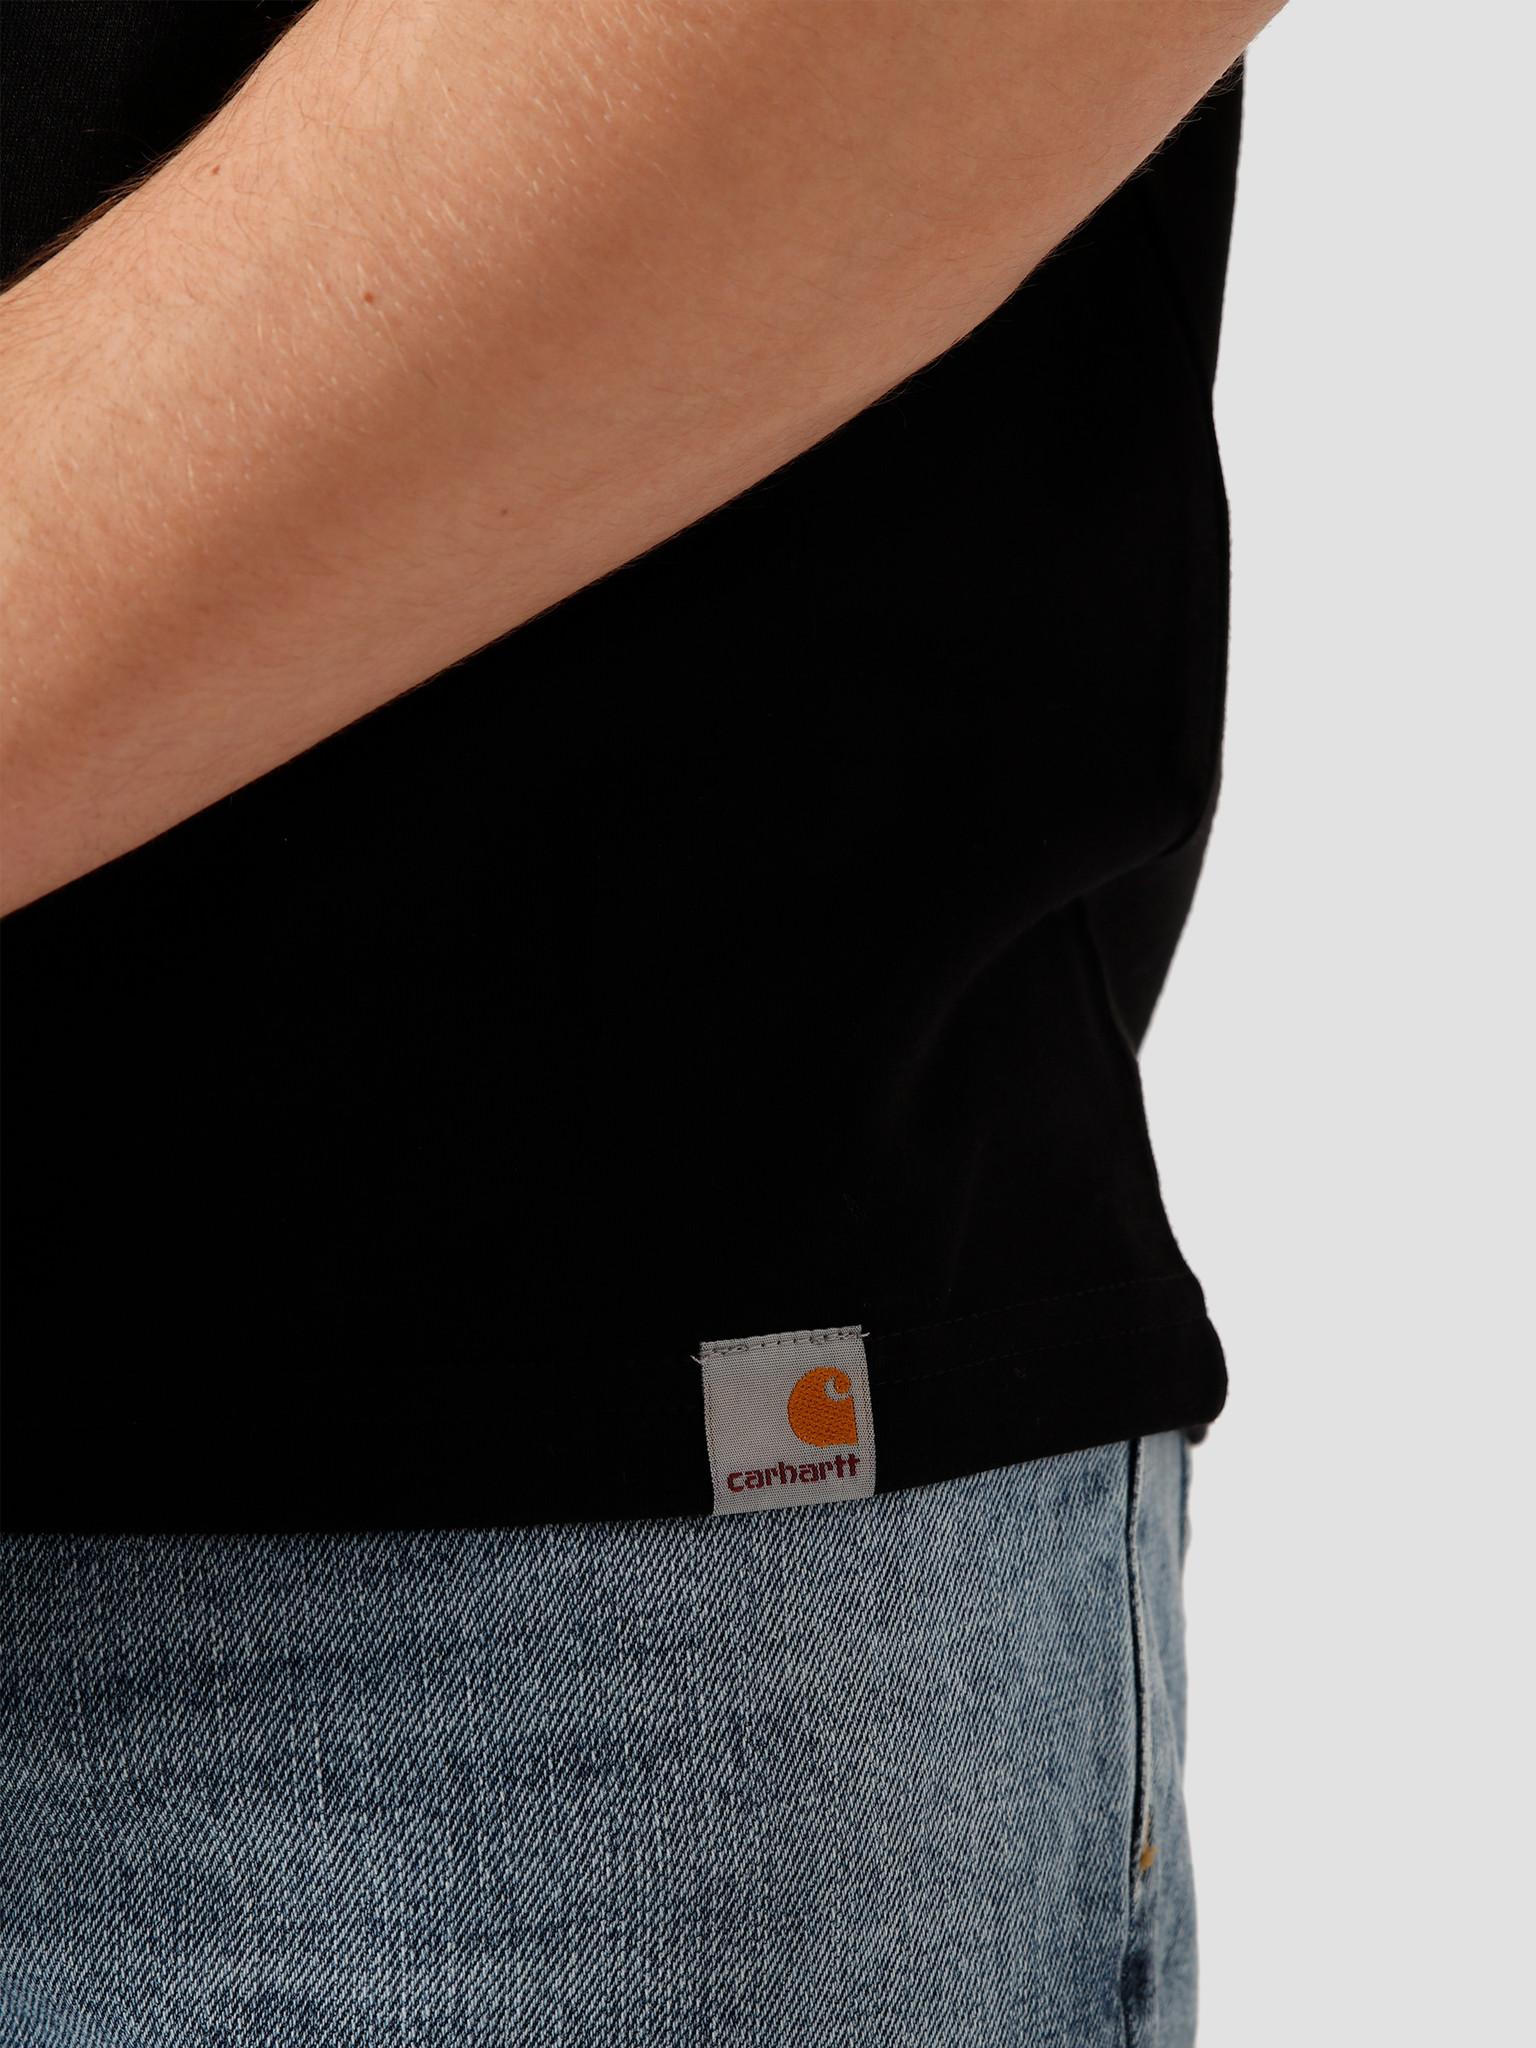 Carhartt WIP Carhartt WIP Romance T-Shirt Black I028494-8900